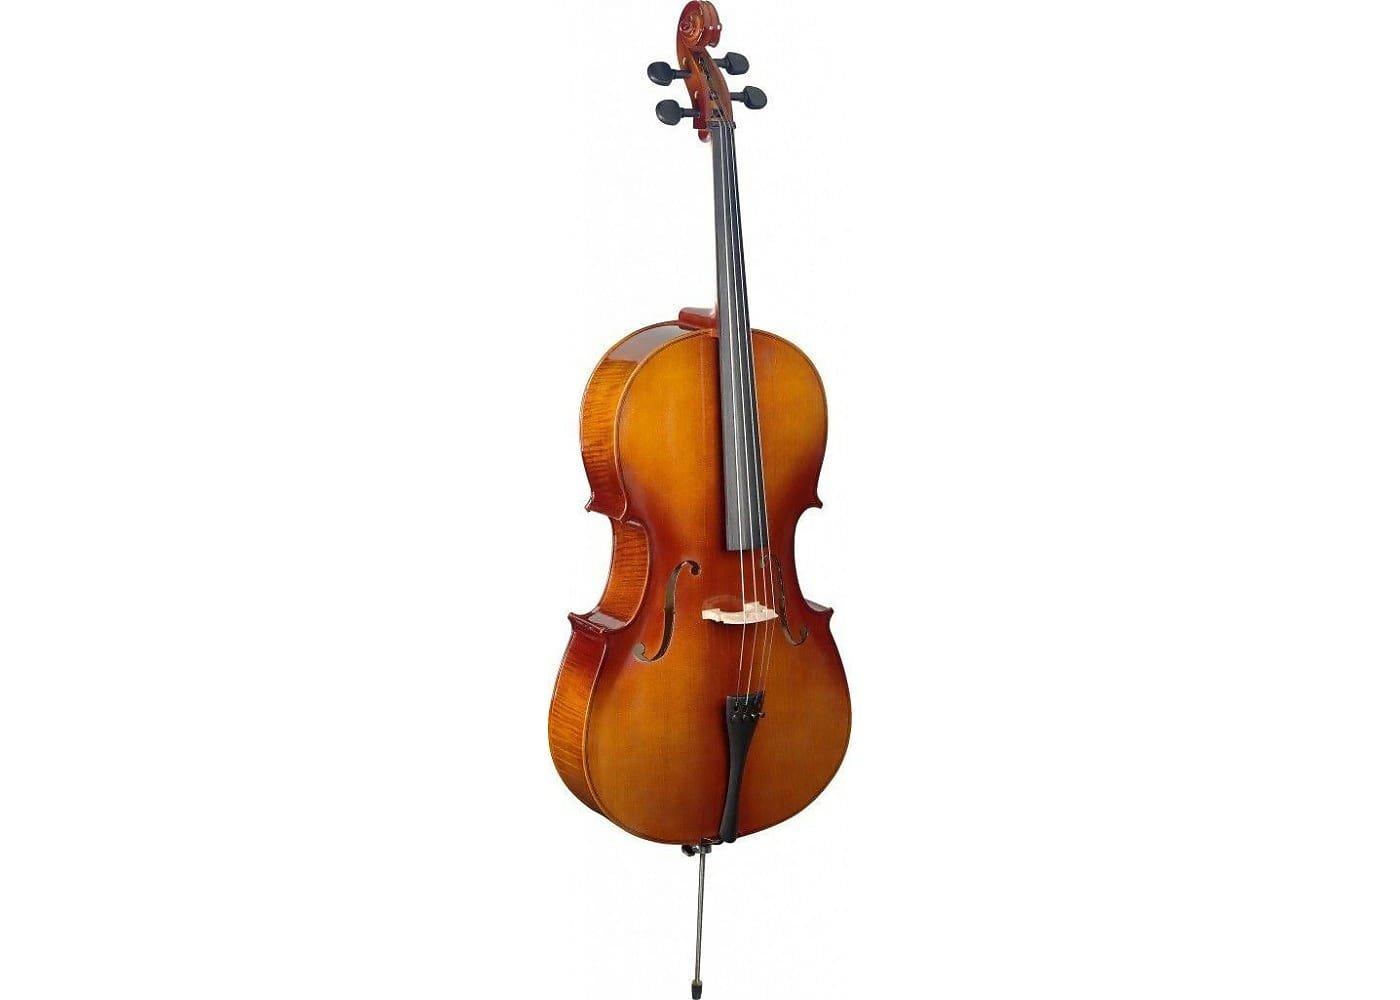 Hofner STINGLC12 1/2 Cello